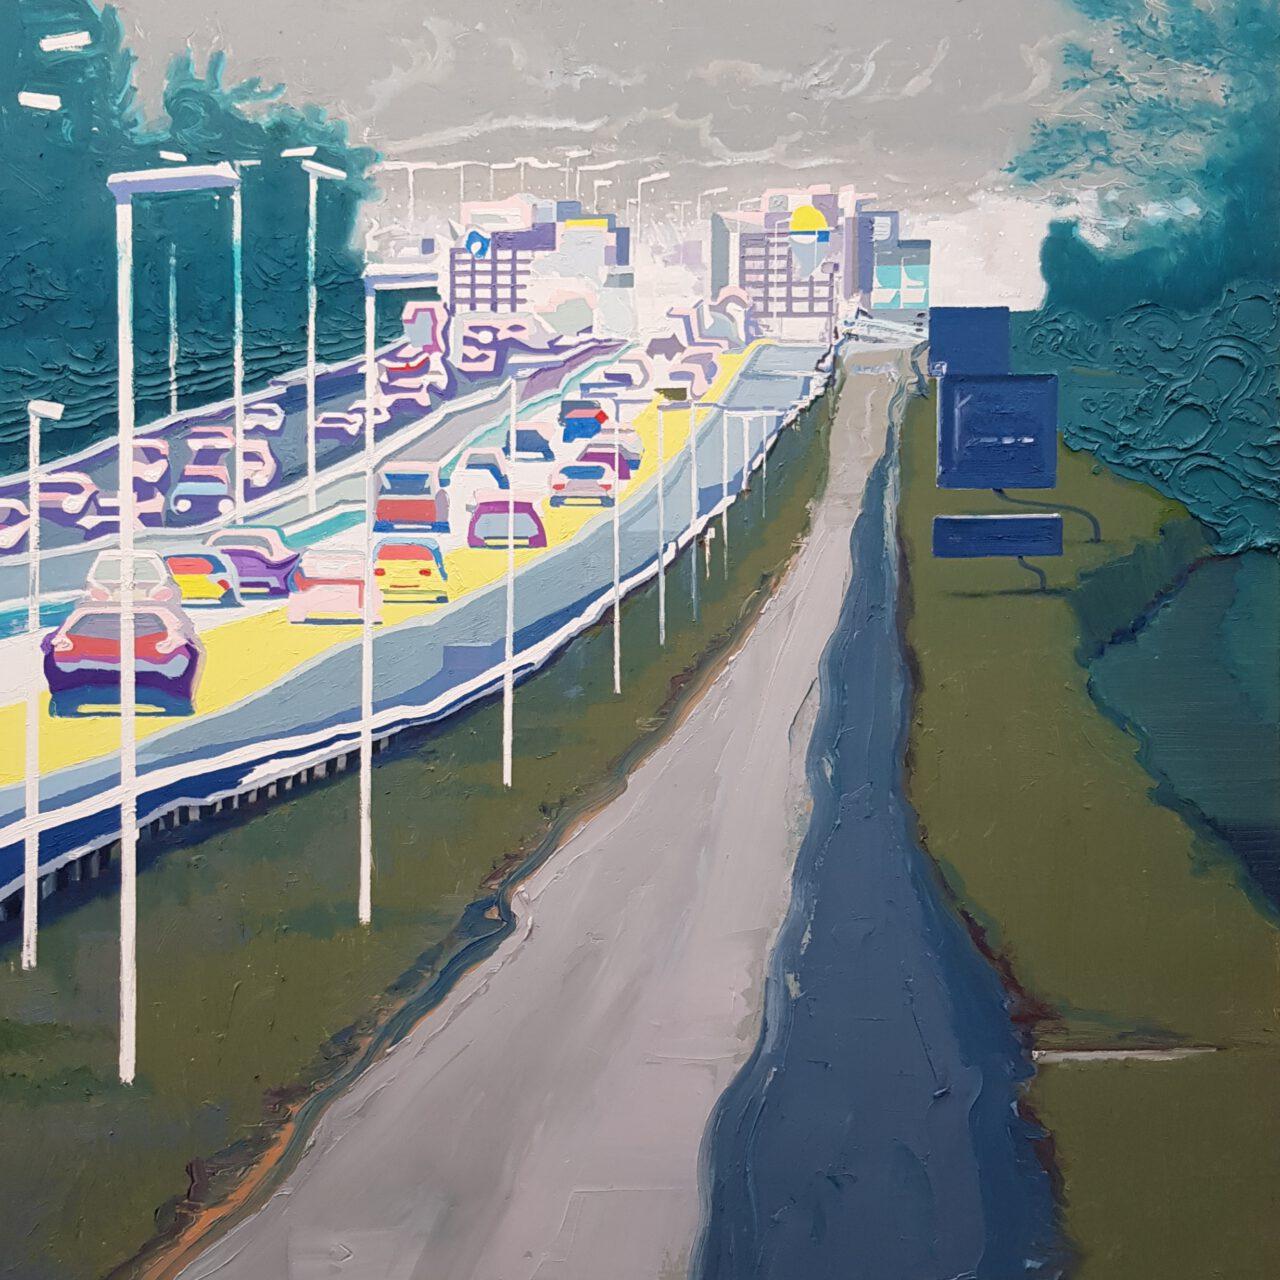 Radweg entlang der Autobahn, 2021. Oil on linen, 120x100cm